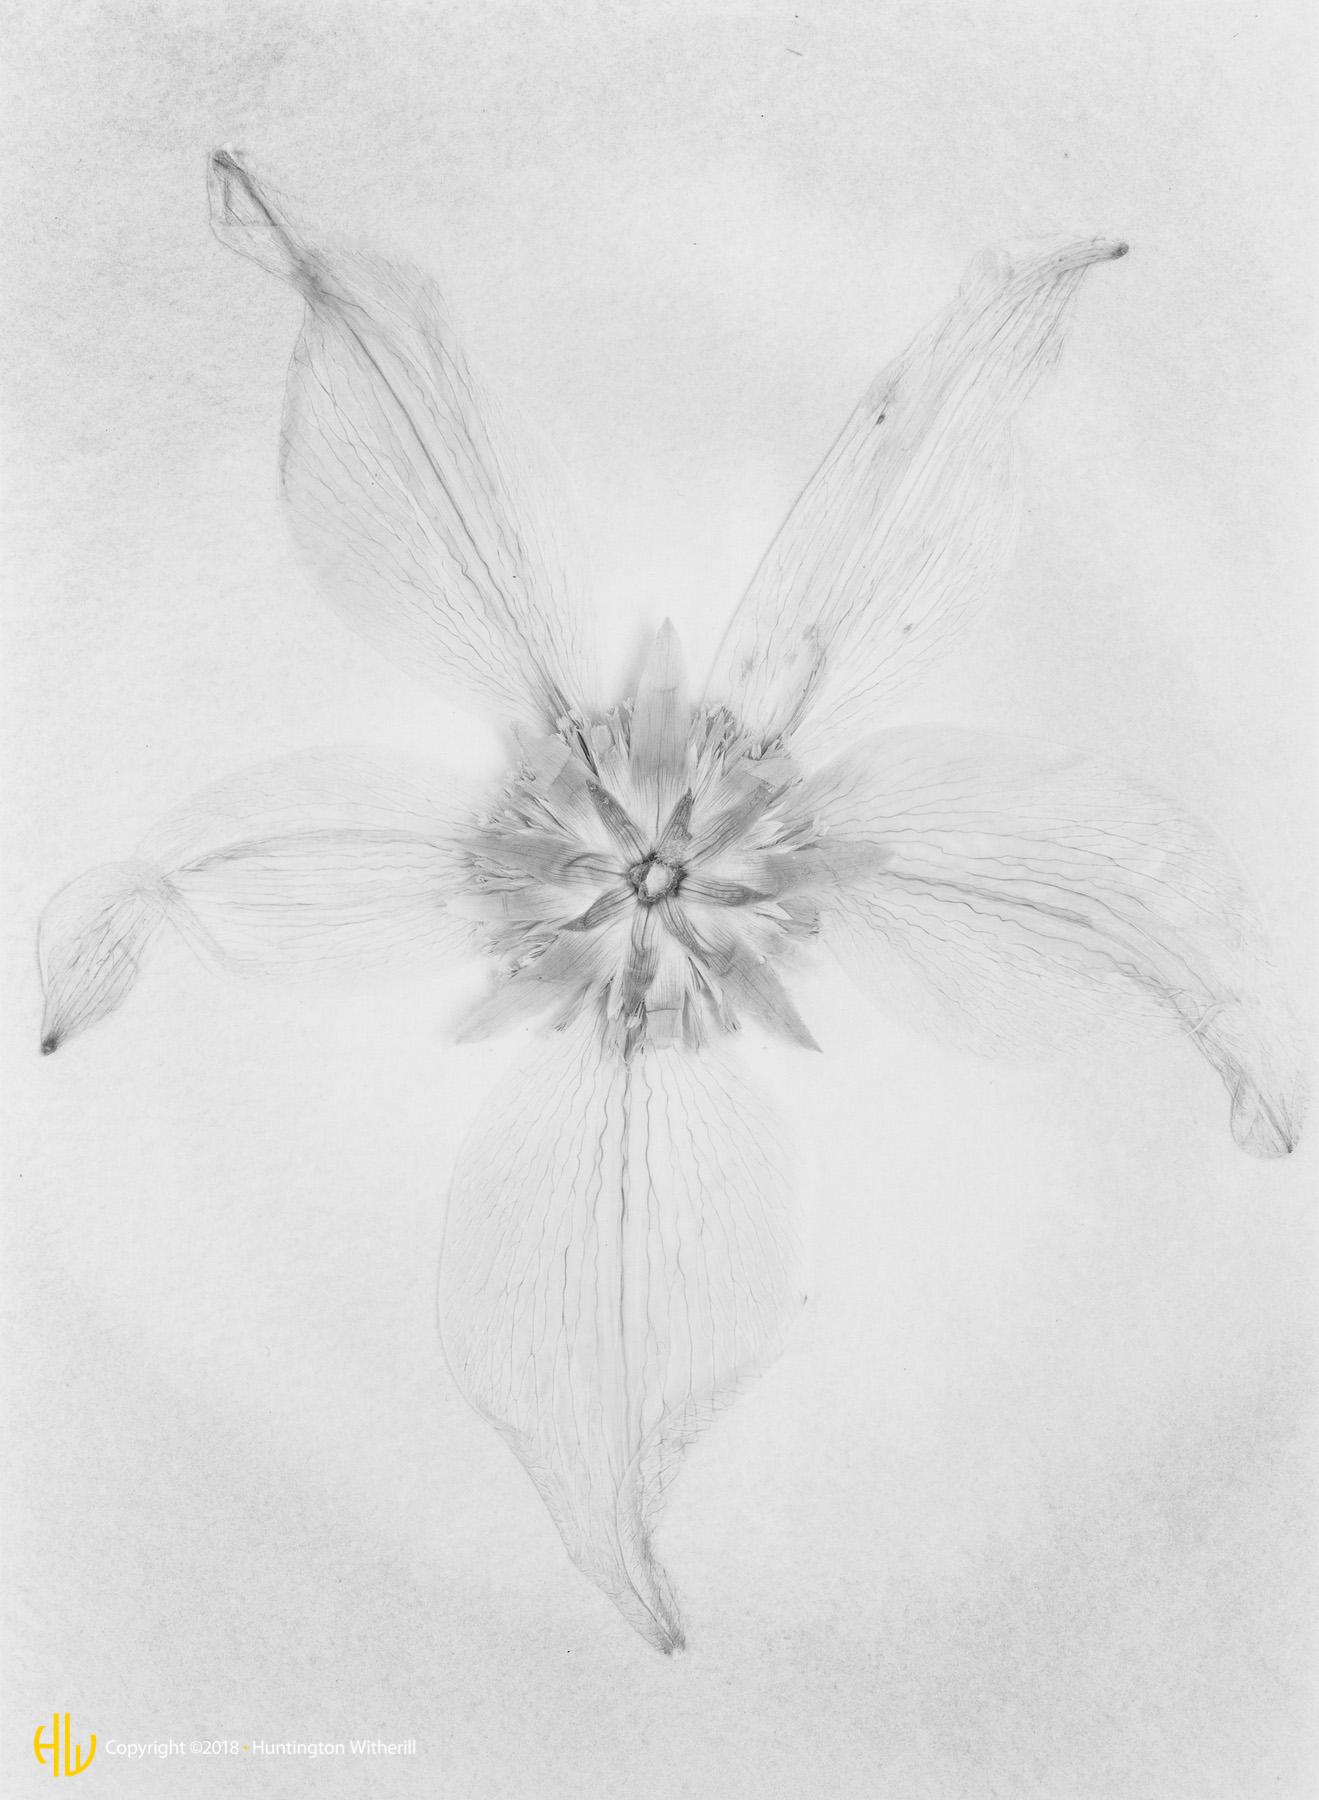 Untitled Flower, 1989